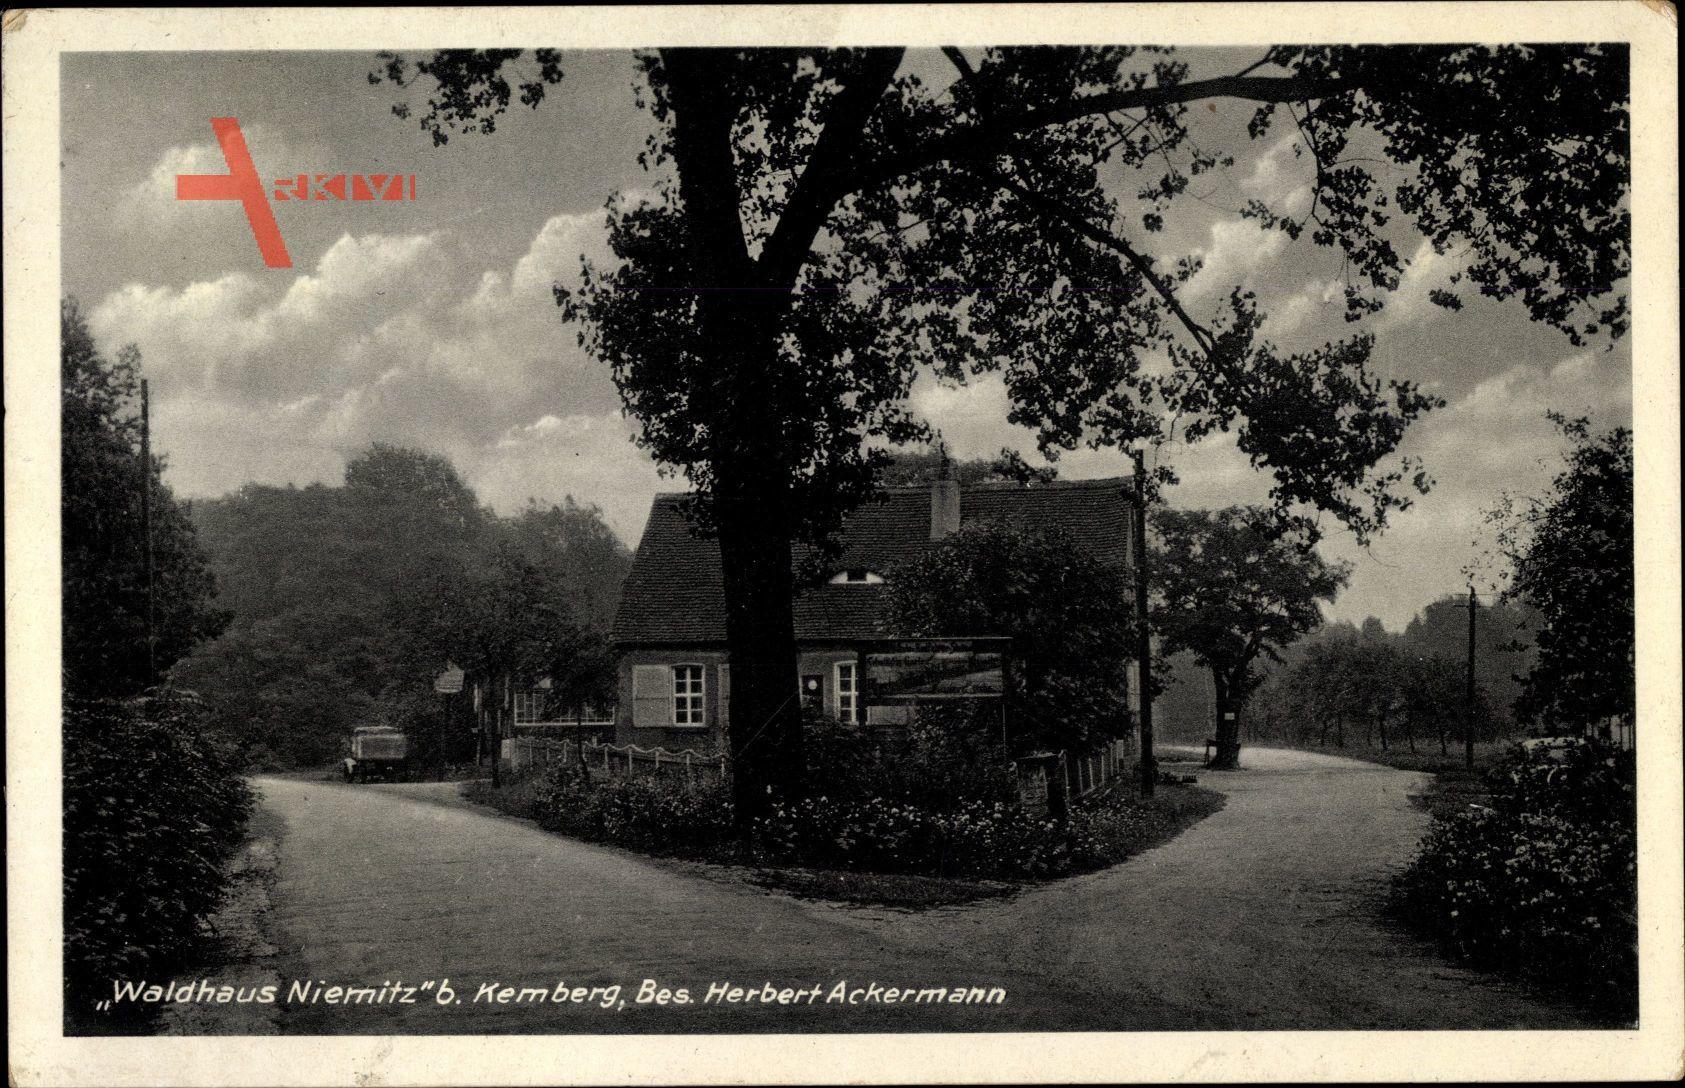 Niemitz Kemberg in der Dübener Heide, Waldhaus, Bes. Herbert Ackermann